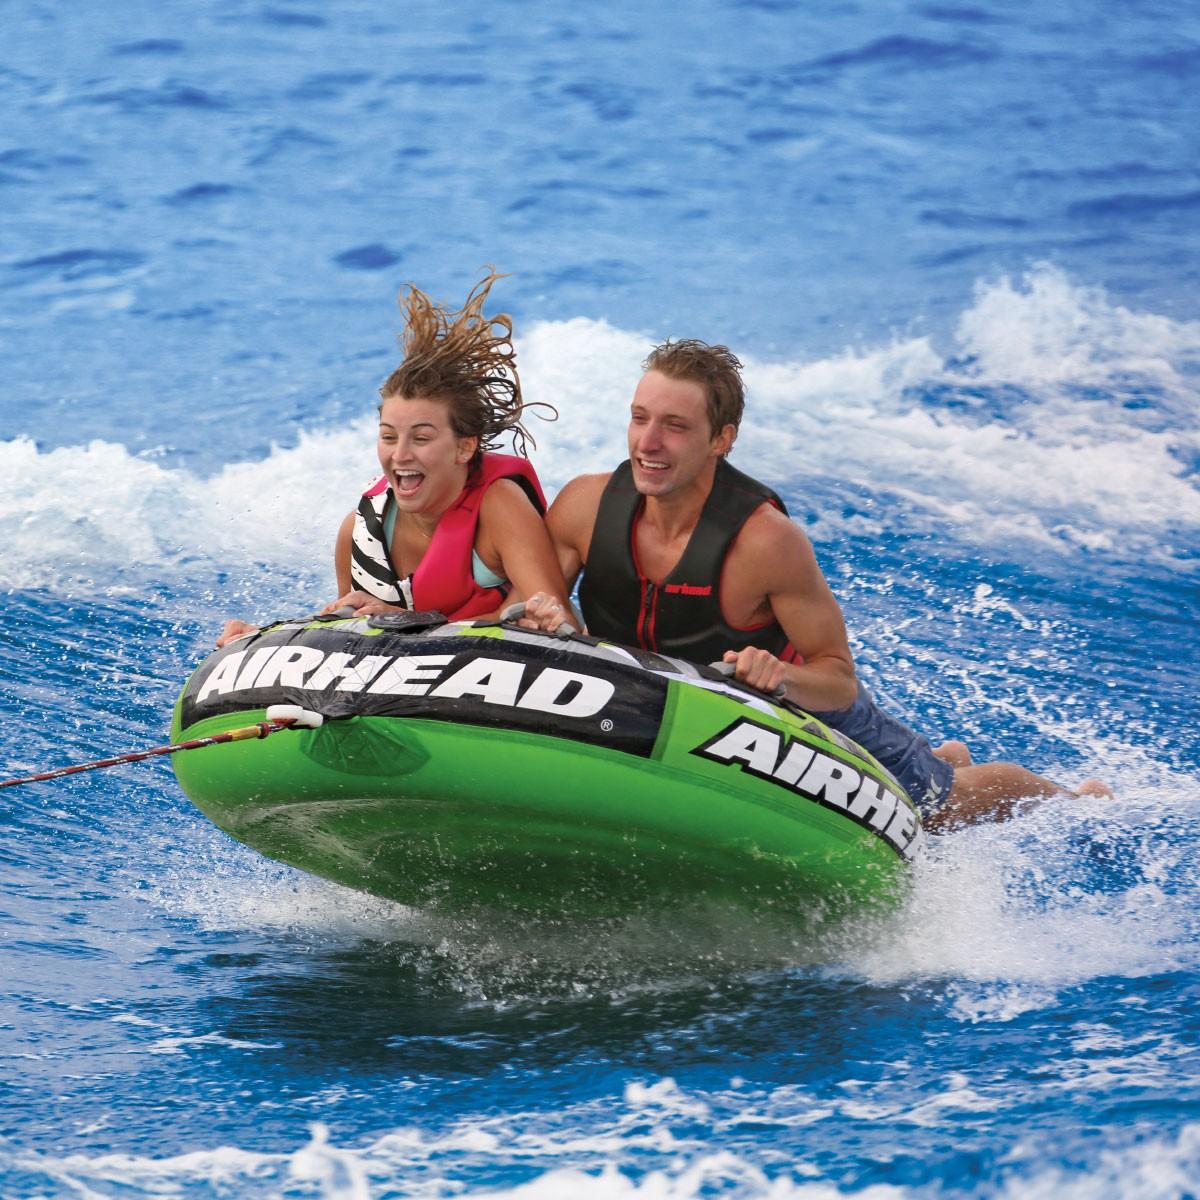 AIRHEAD トーイングチューブ Slice 2人乗り ジェットスキー マリンスポーツ 複数 グループ 海 おもちゃ ボート フロート グッズ